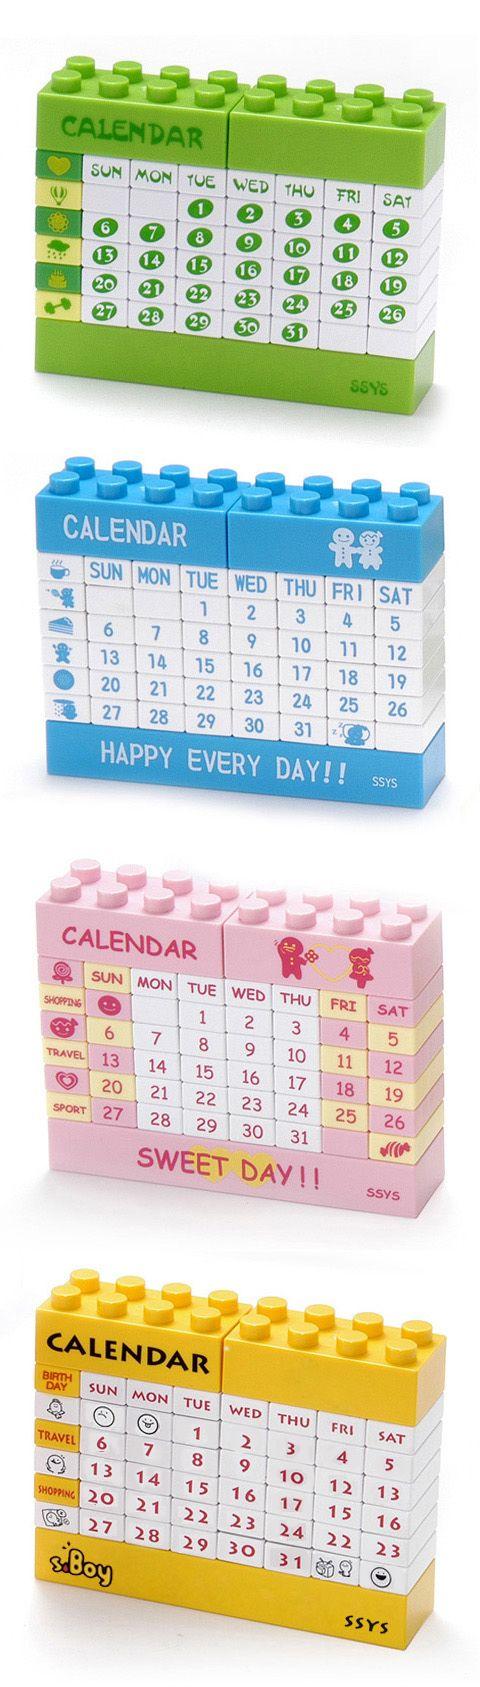 cute Lego calendars.......could DIY